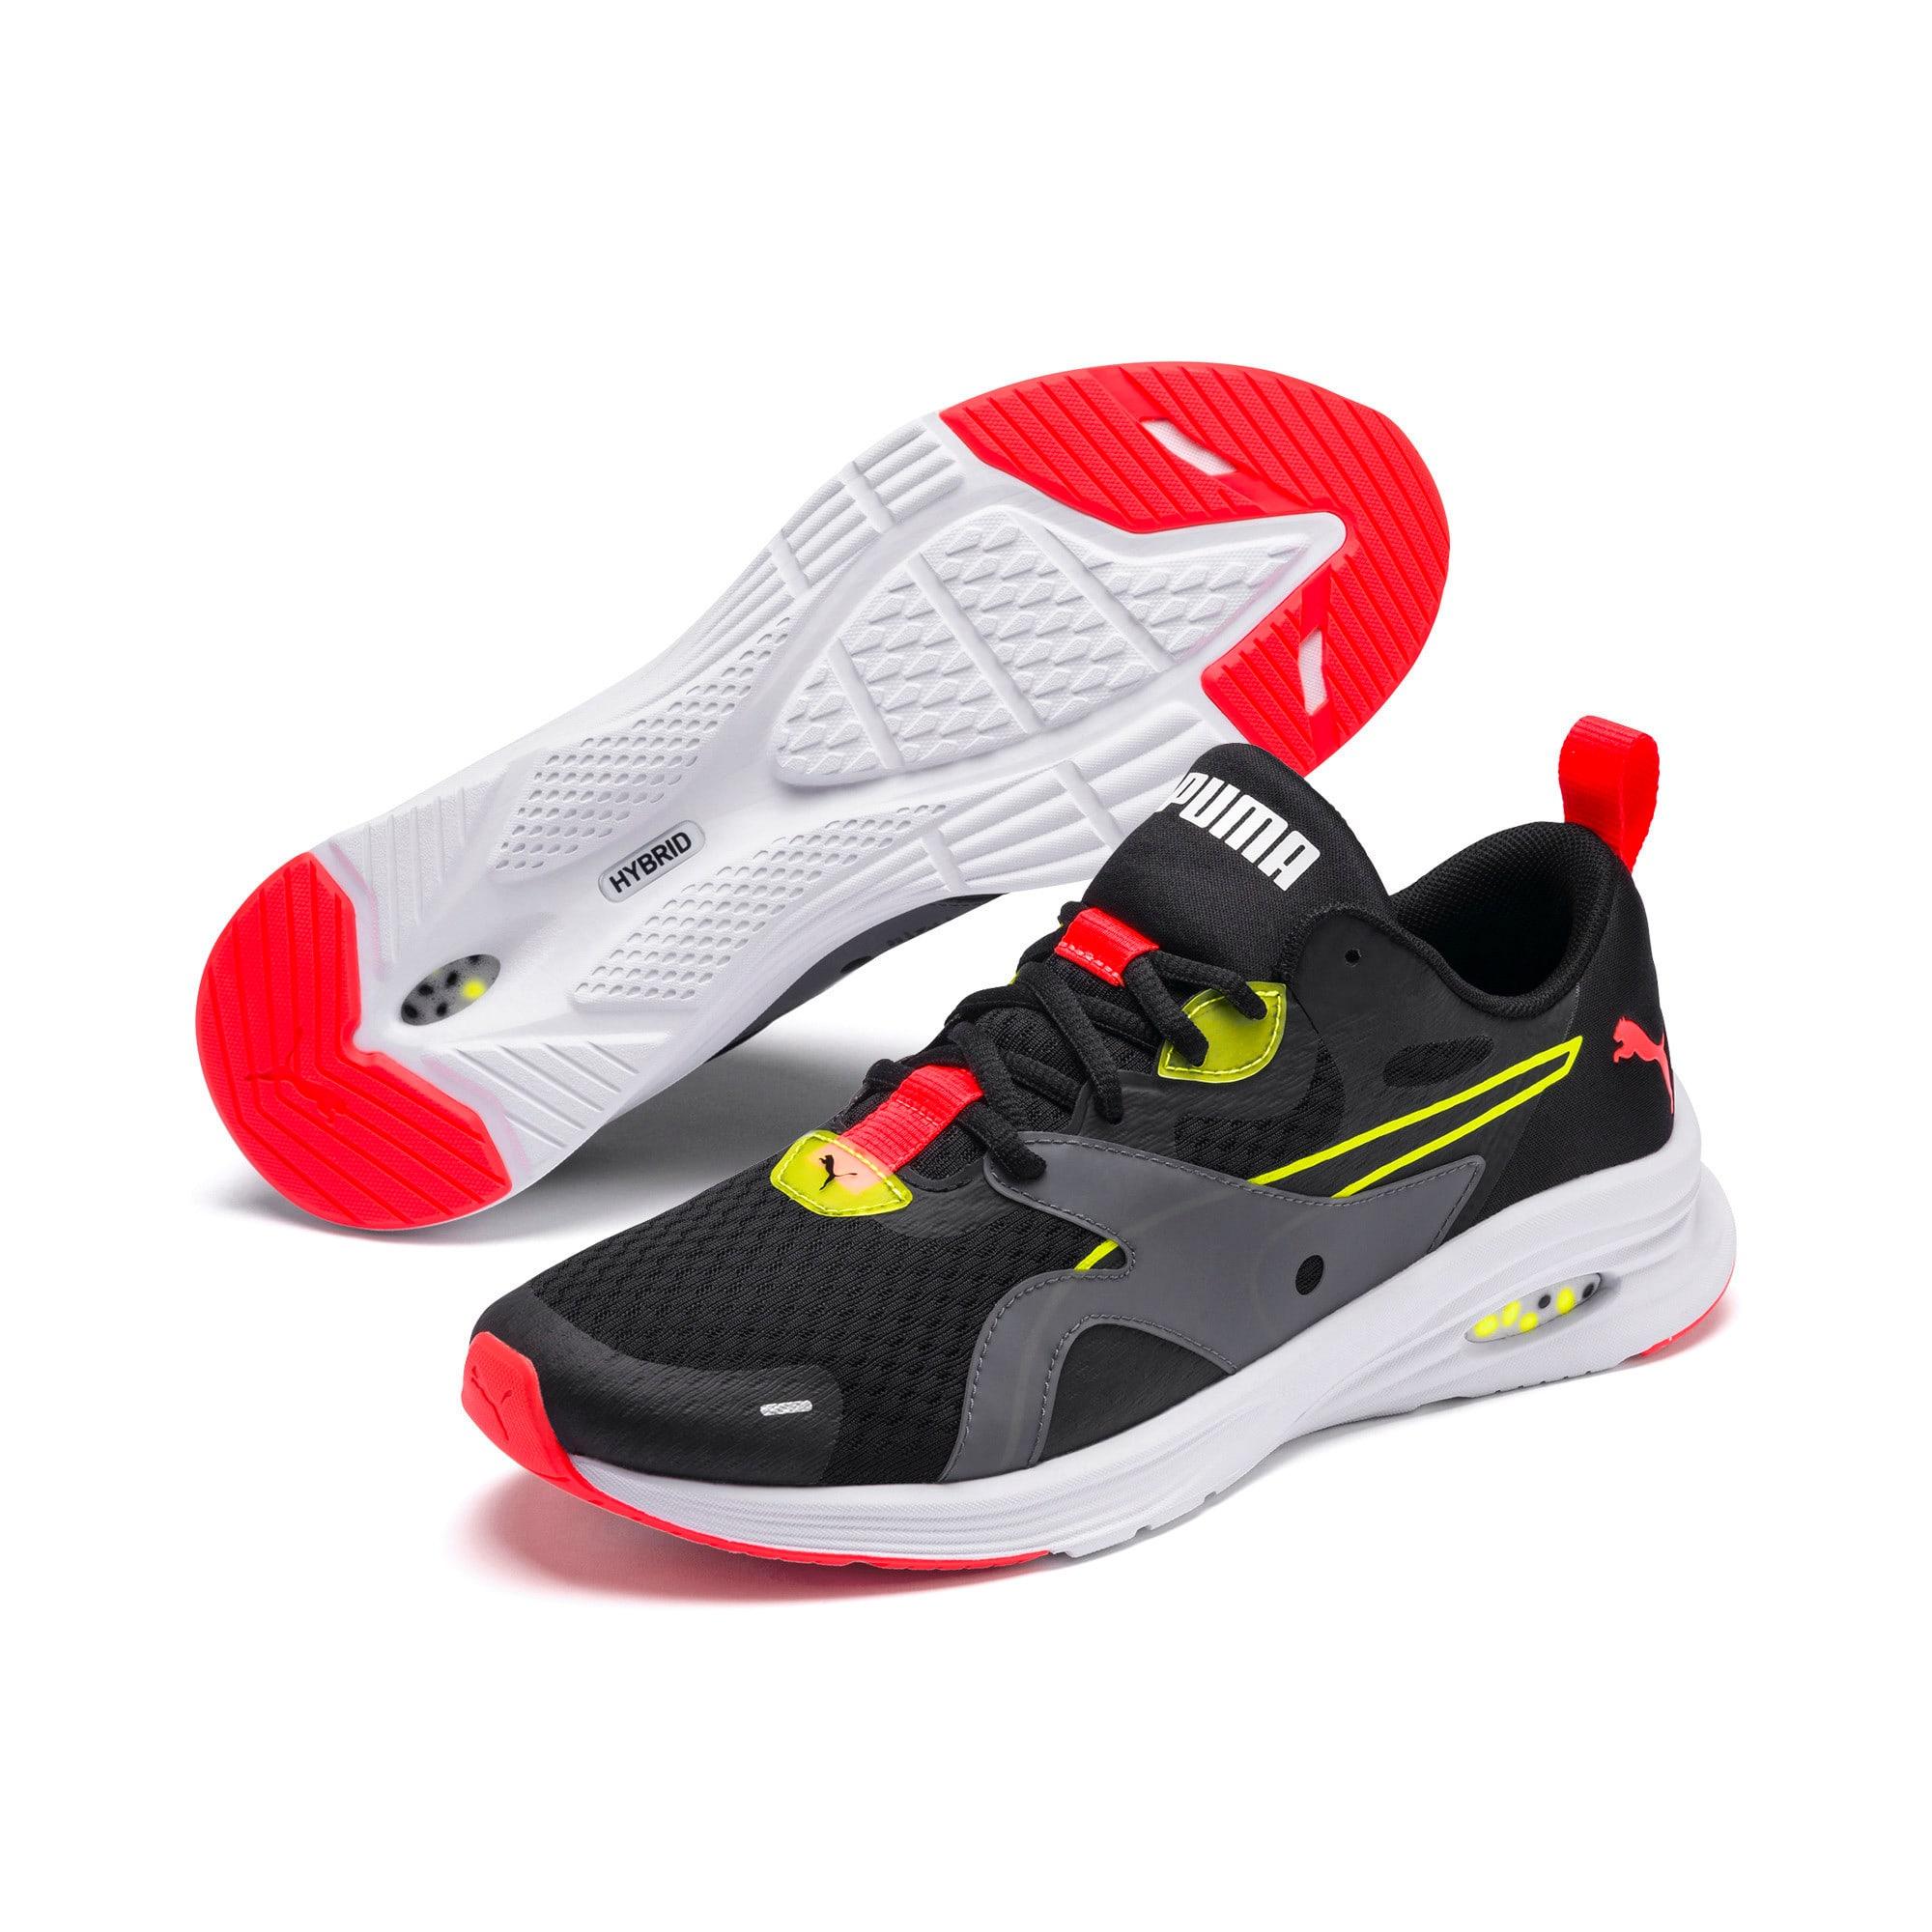 Thumbnail 2 of HYBRID Fuego Men's Running Shoes, Puma Black-Yellow Alert, medium